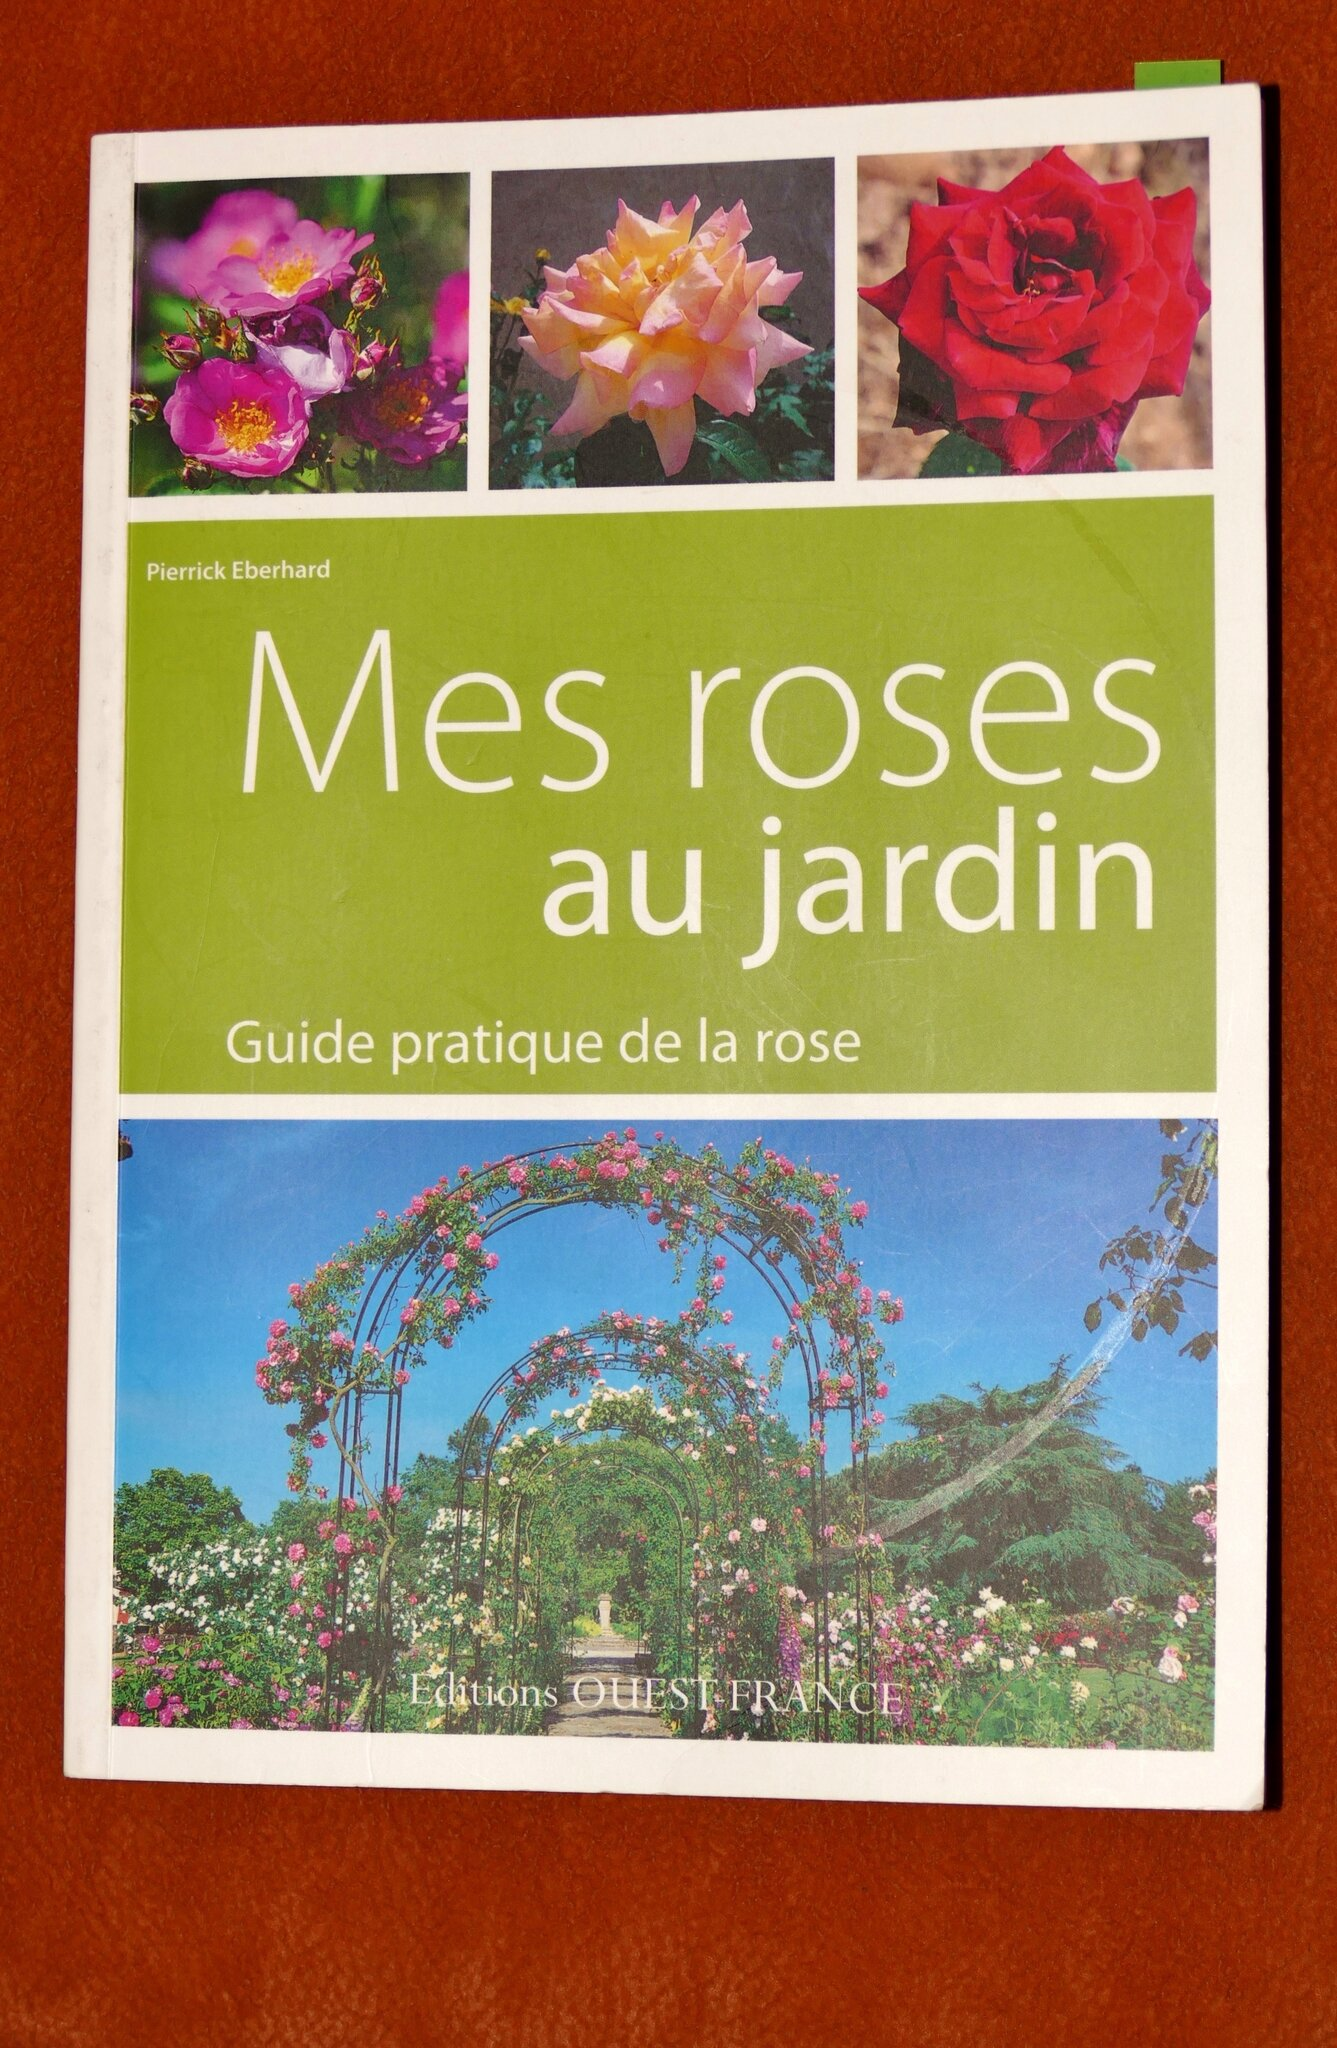 Livre: Mes roses au jardin